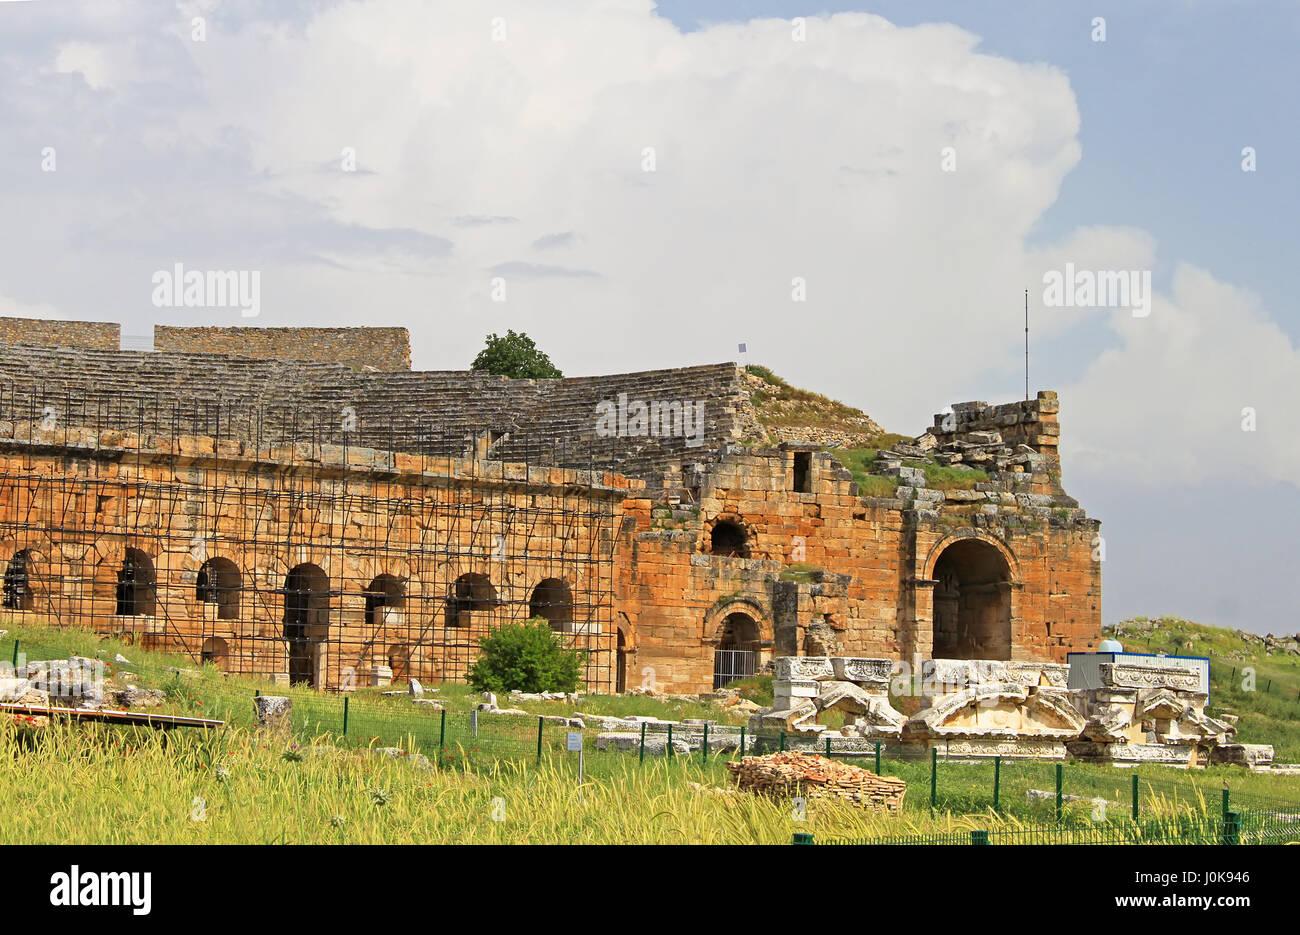 Part of ancient amphitheater near Pamukkale in Hierapolis, Turkey - Stock Image